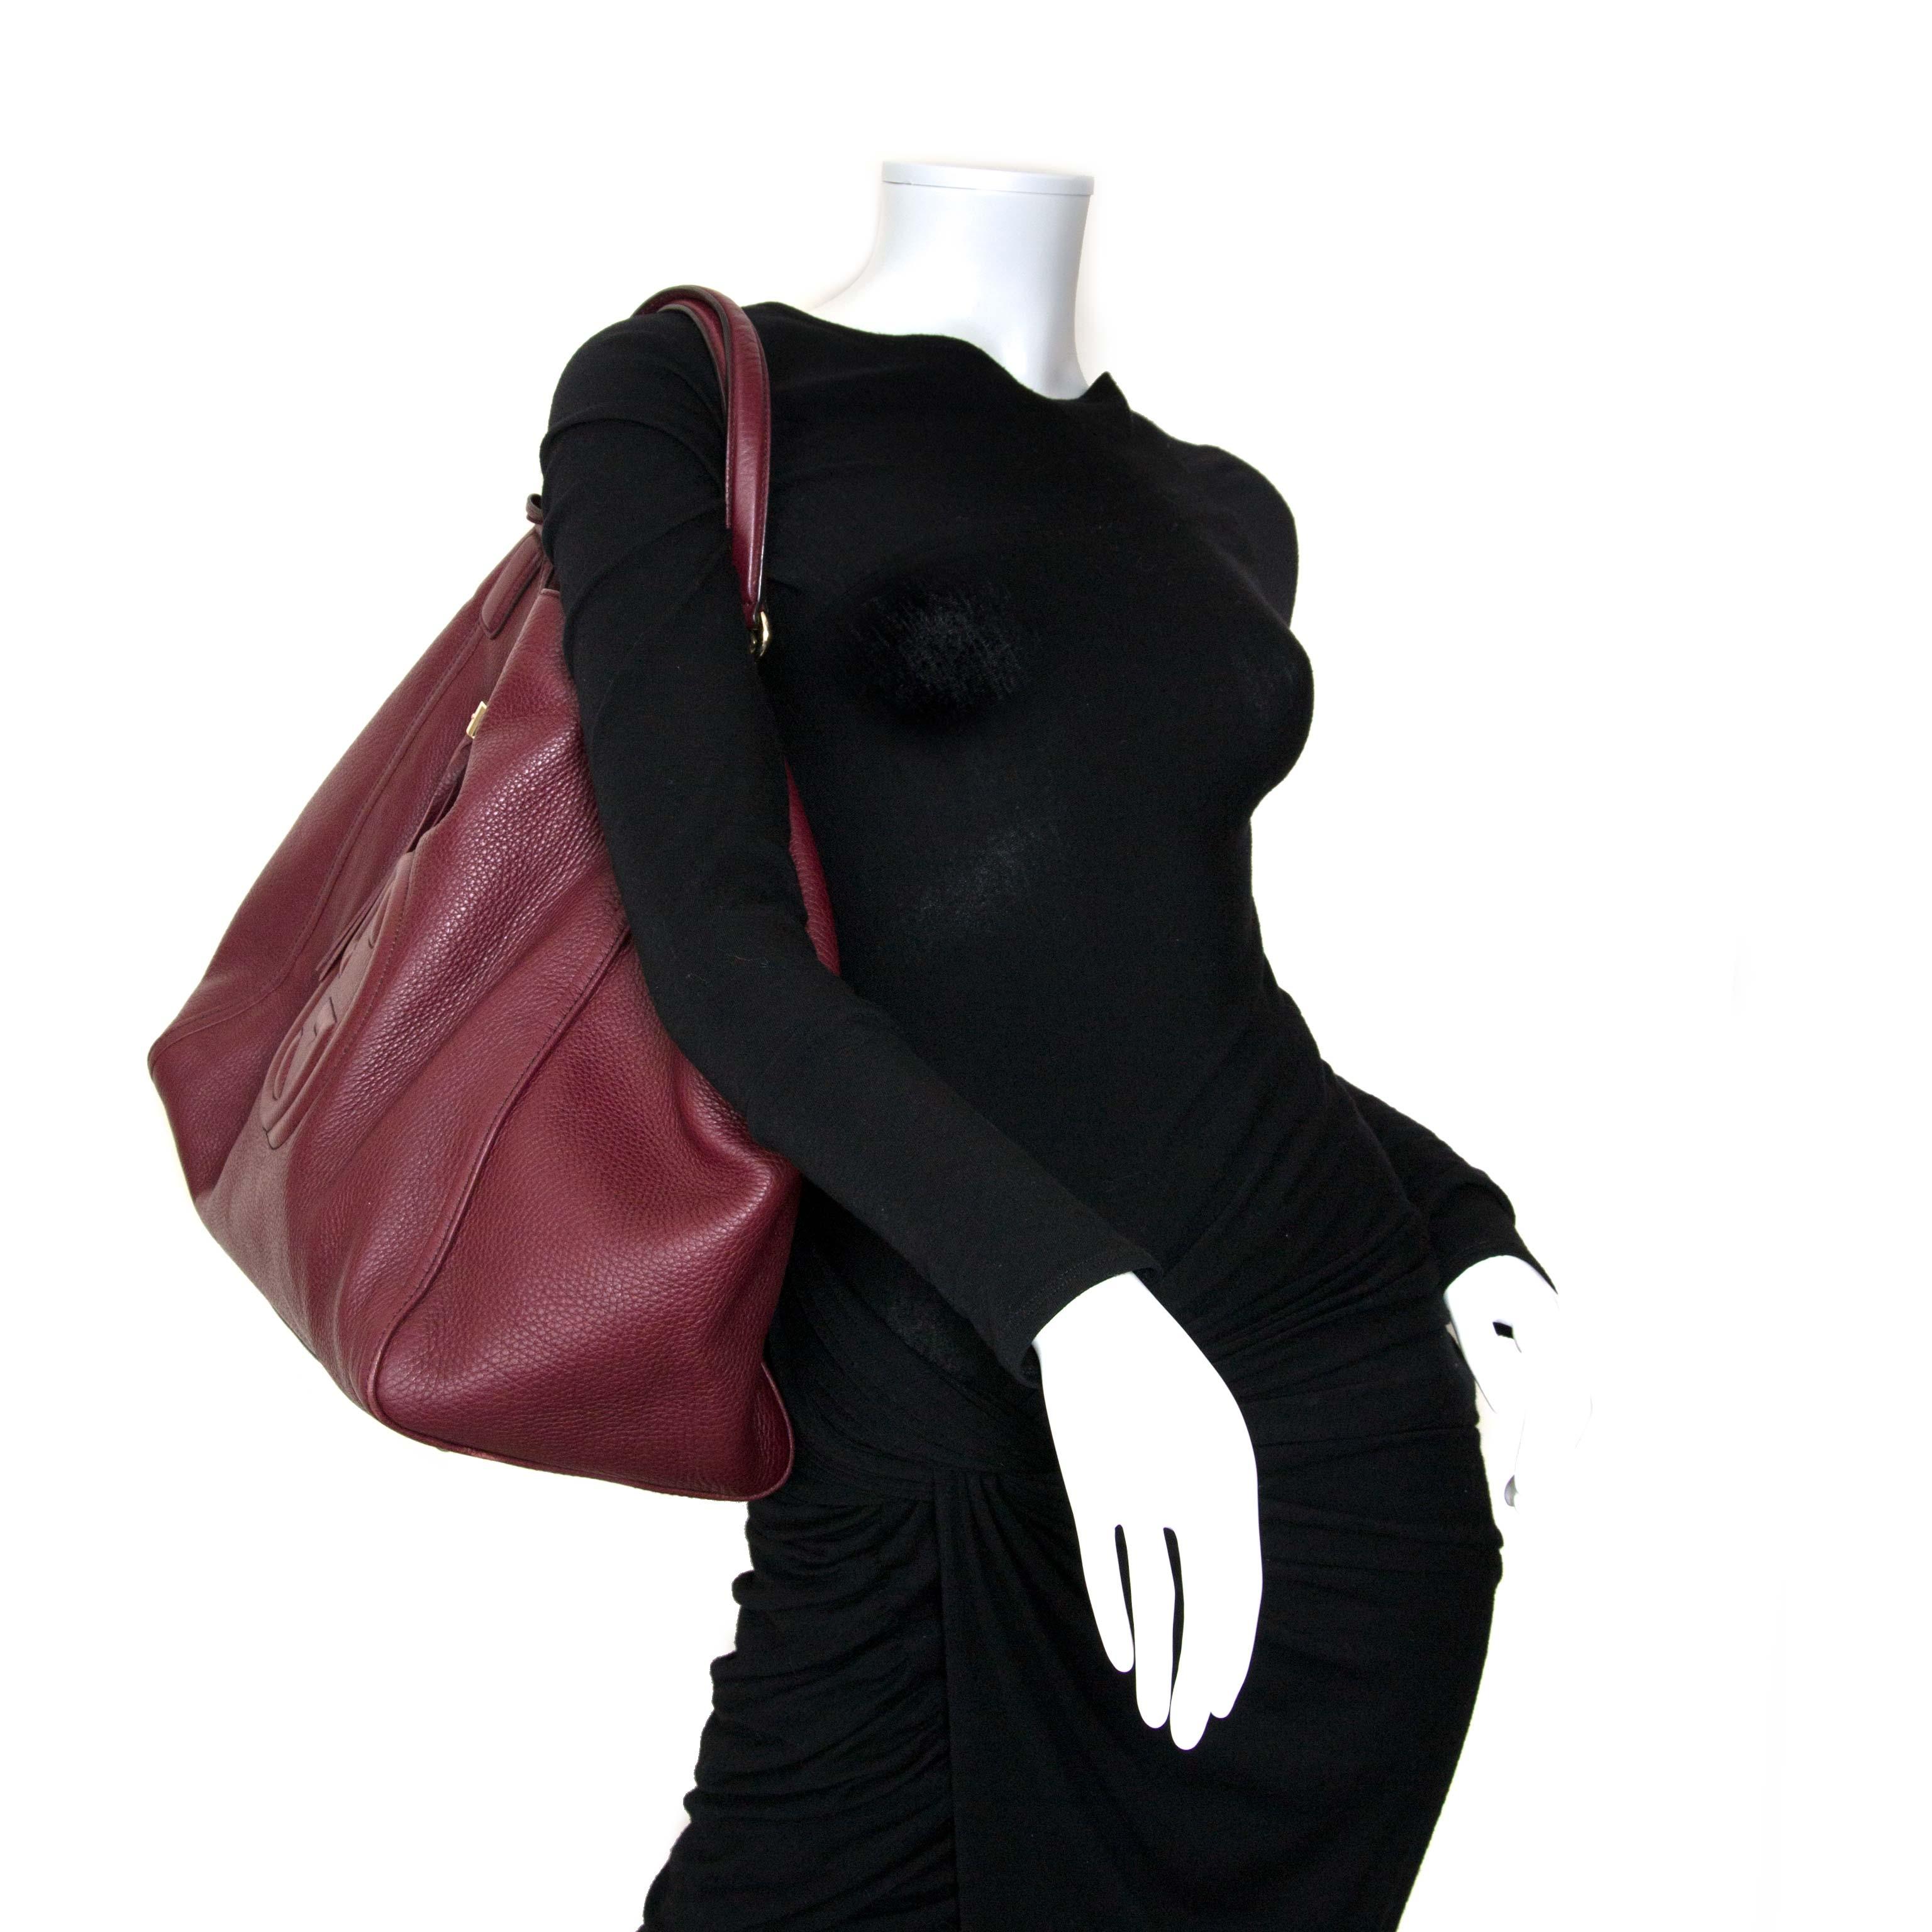 gucci burgundy soho shopper now for sale at labellov vintage fashion webshop belgium